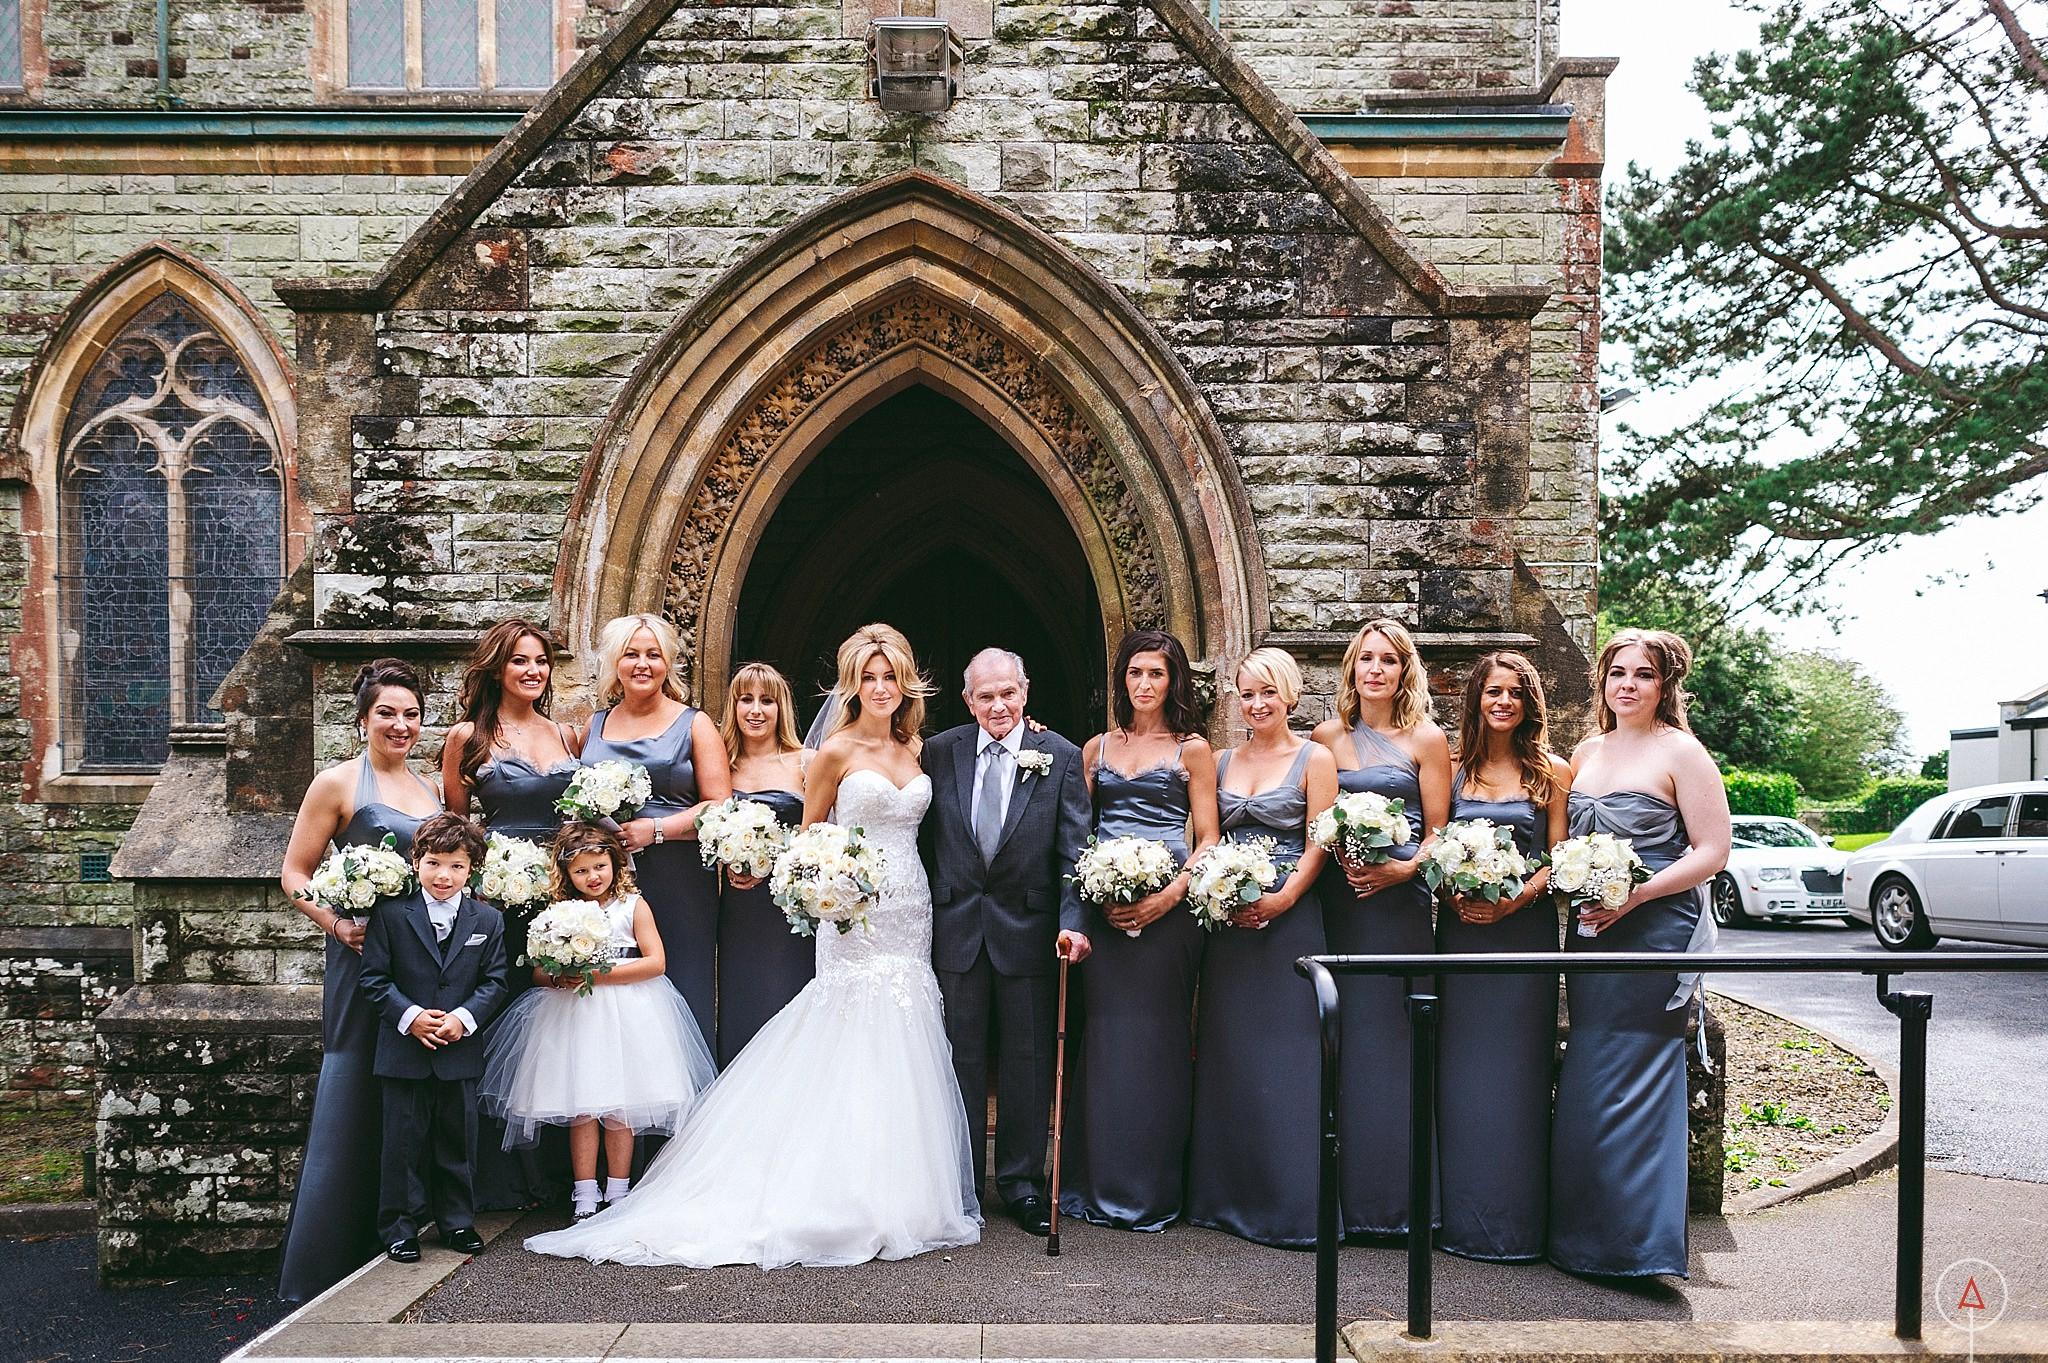 cardiff-wedding-photographer-aga-tomaszek_0372